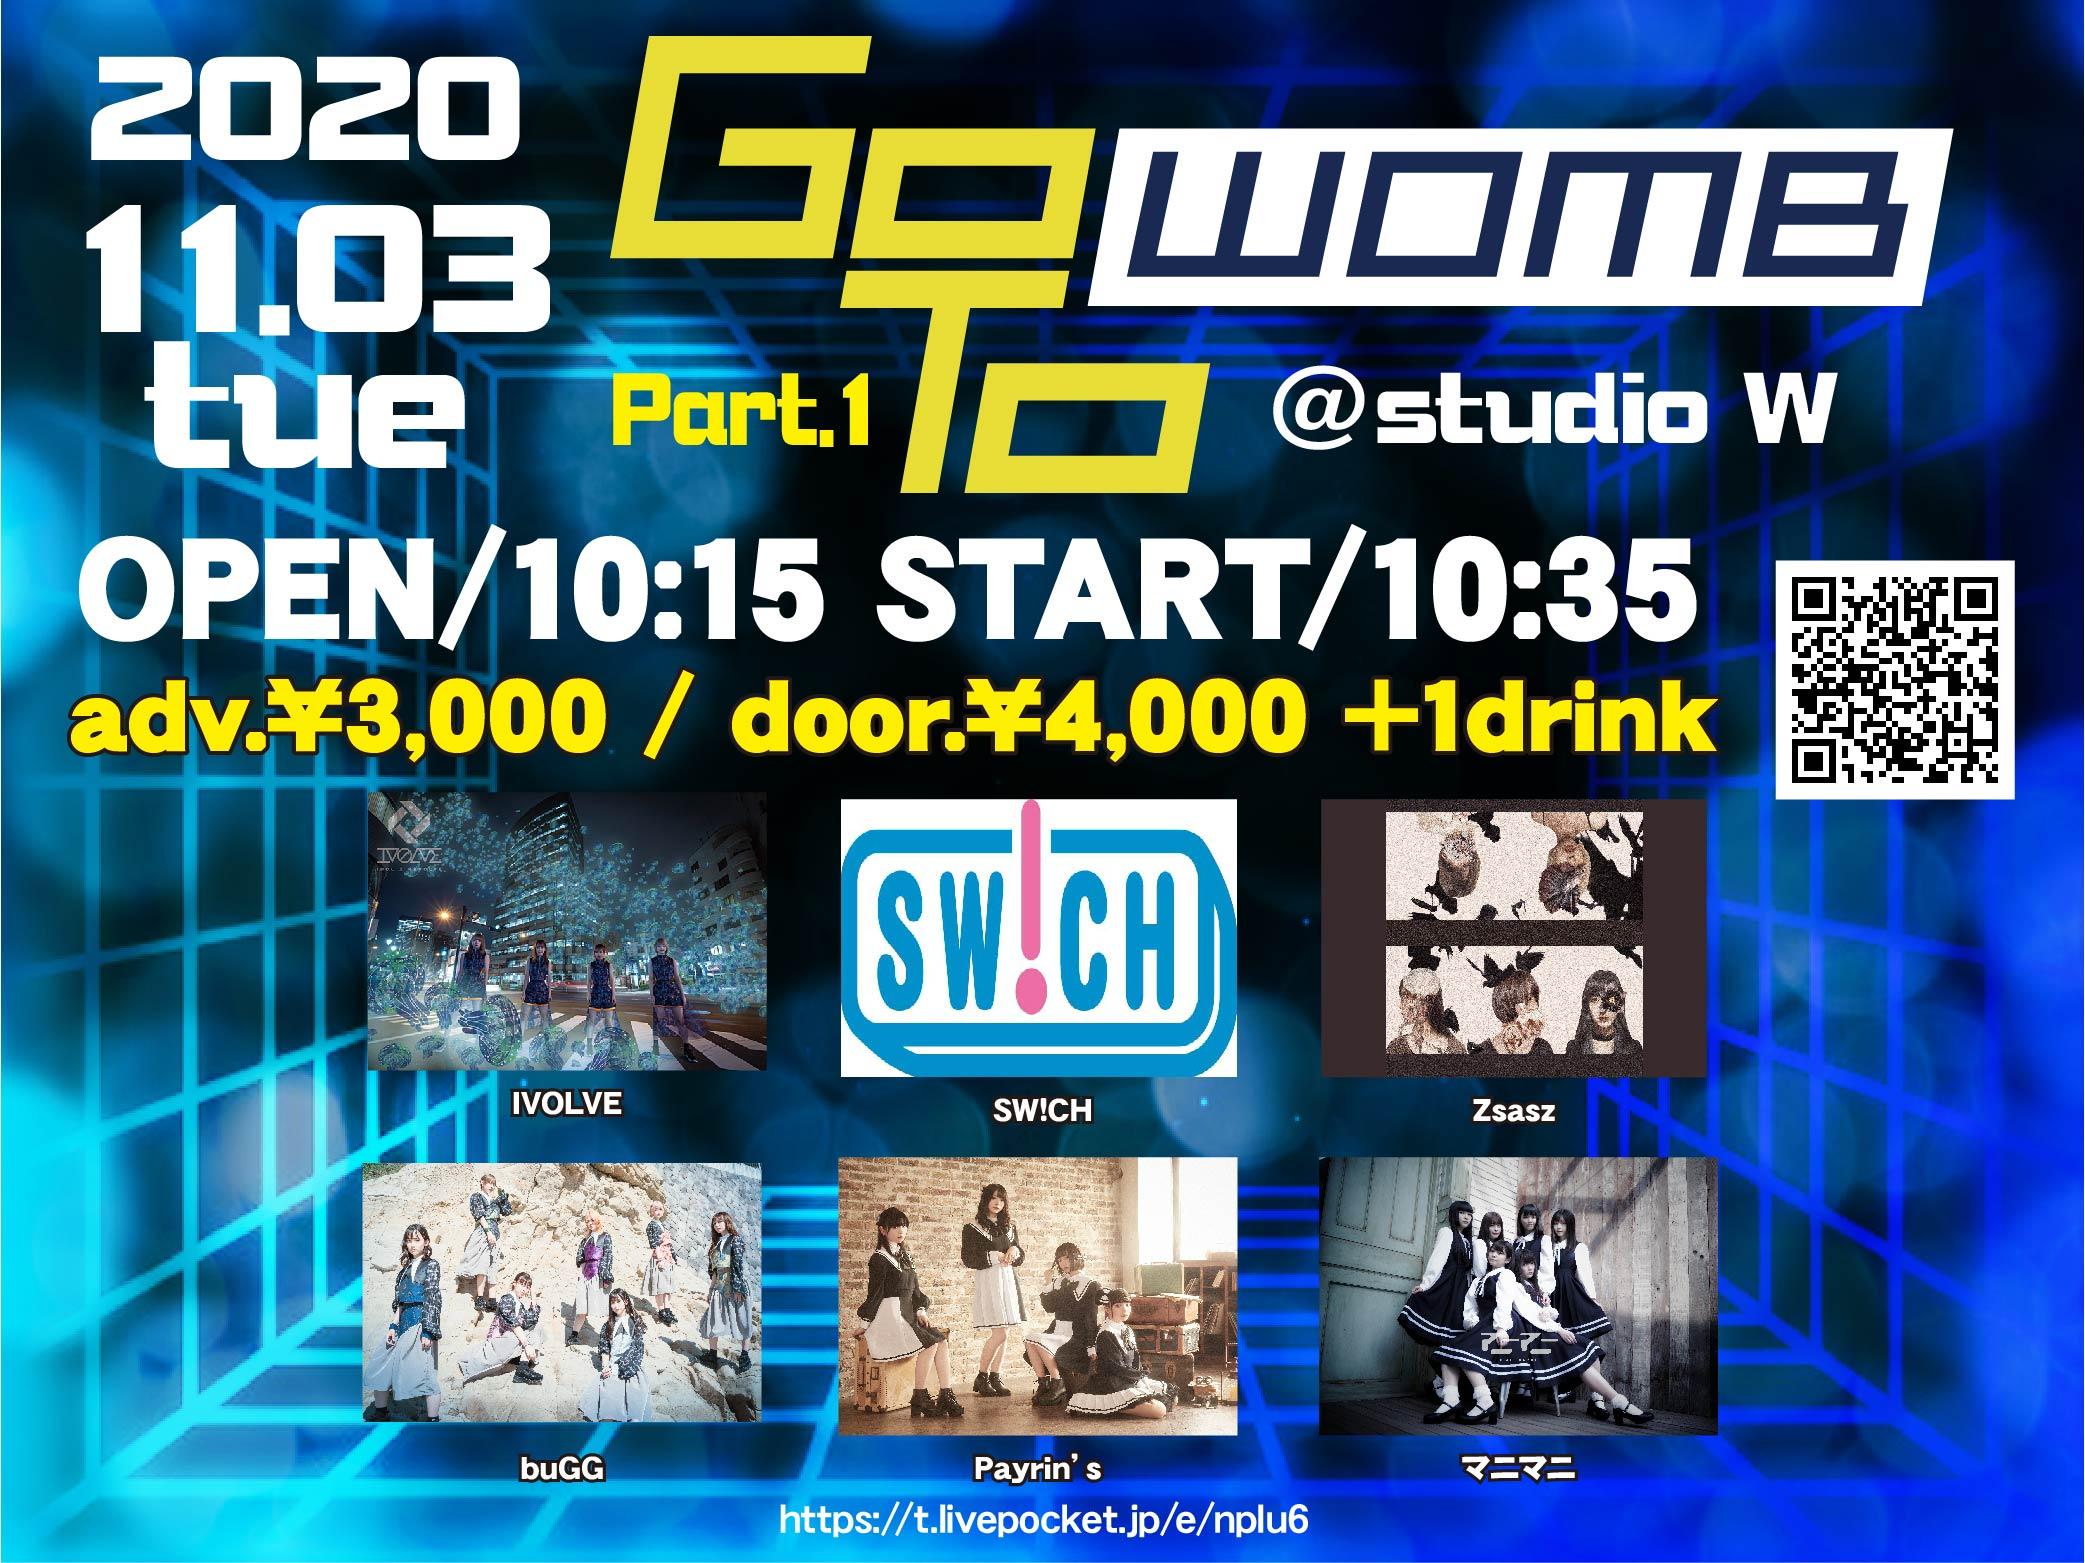 「GoTo WOMB」Part.1   ※「GoTo VISION」が会場変更に伴い「GoTo WOMB」に変更となりました。